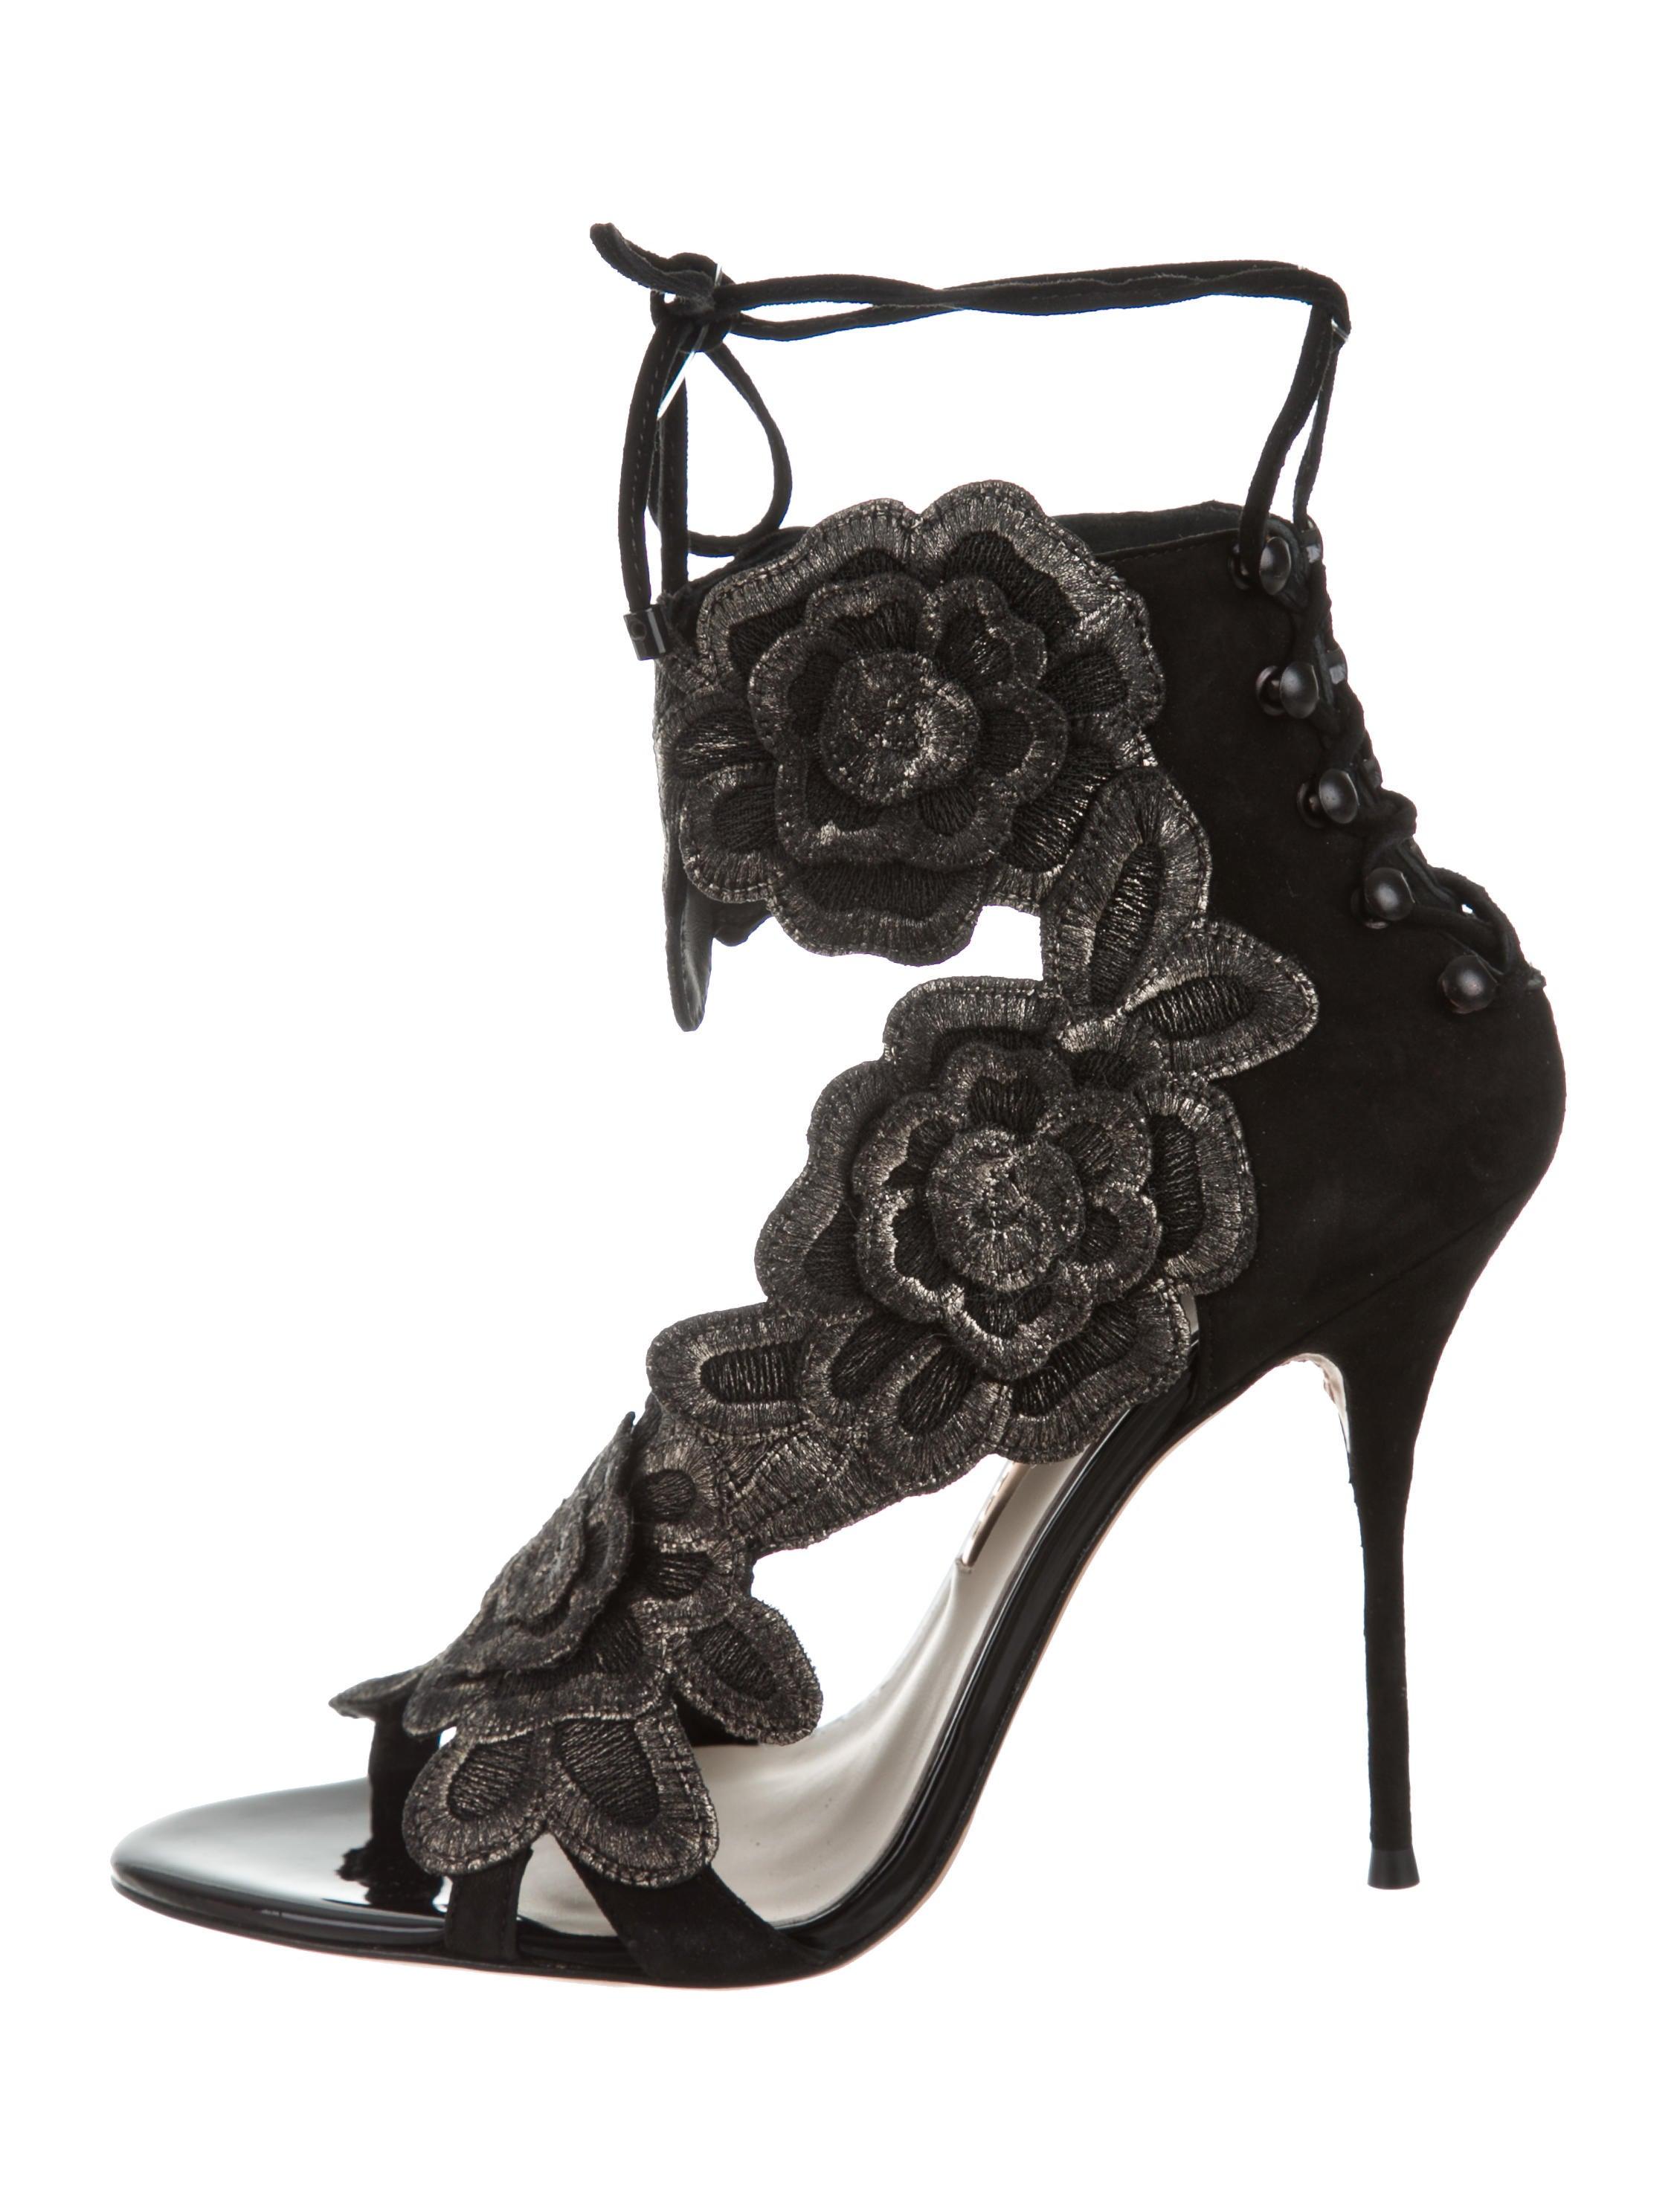 c8bea28d1714 Sophia Webster Suede Winona Sandals - Shoes - W9S21149